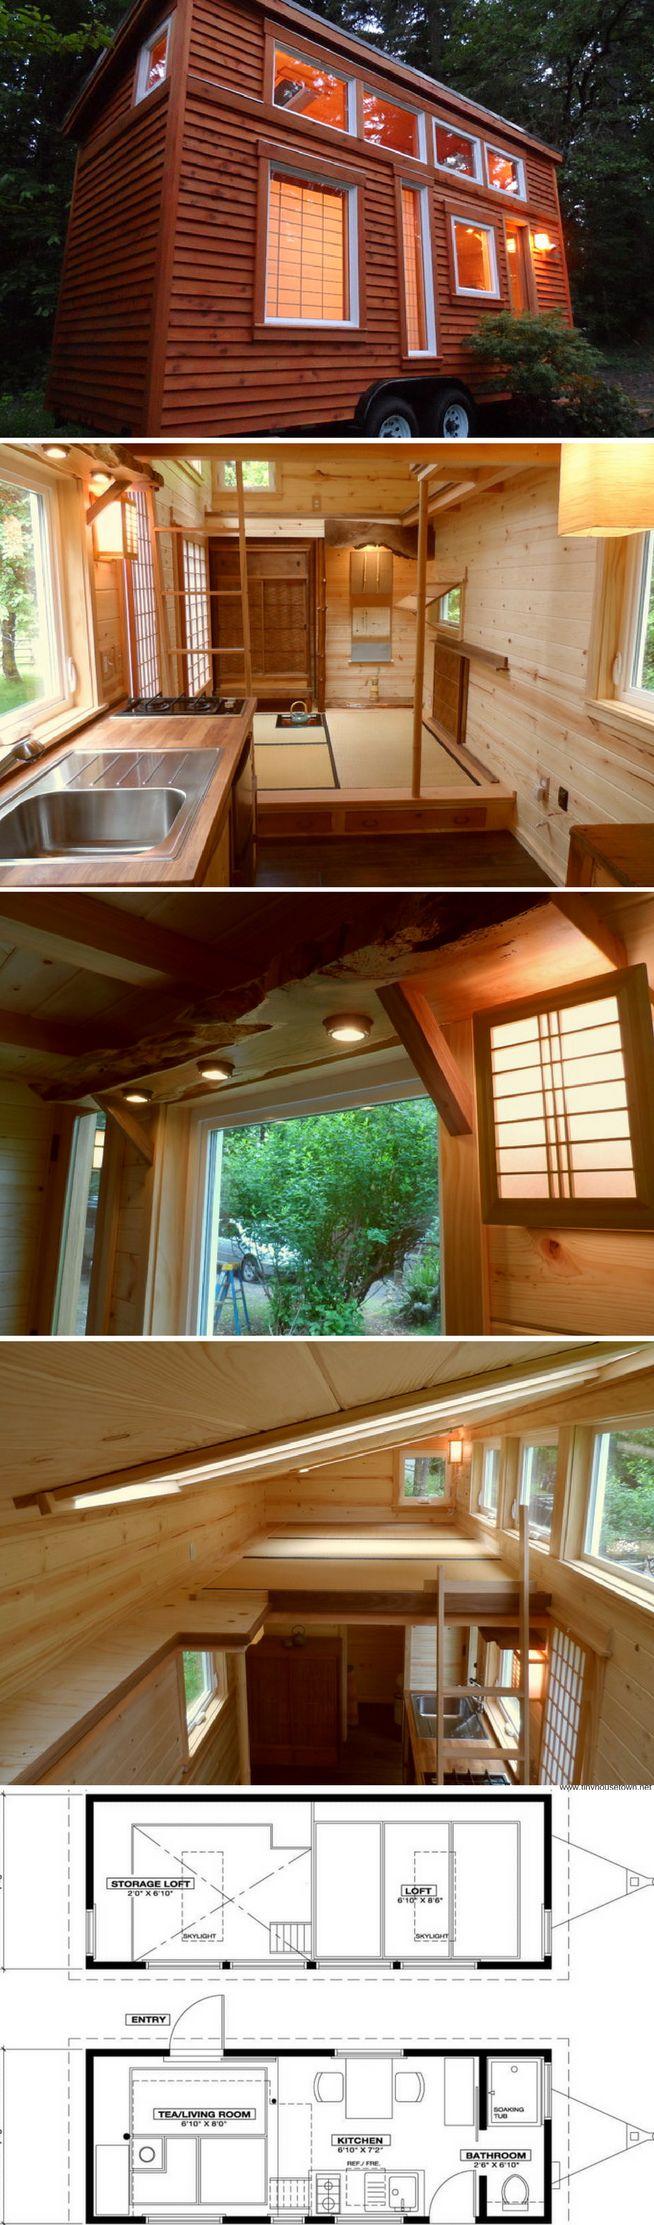 Tiny Tea House Cottage (225 sq ft)